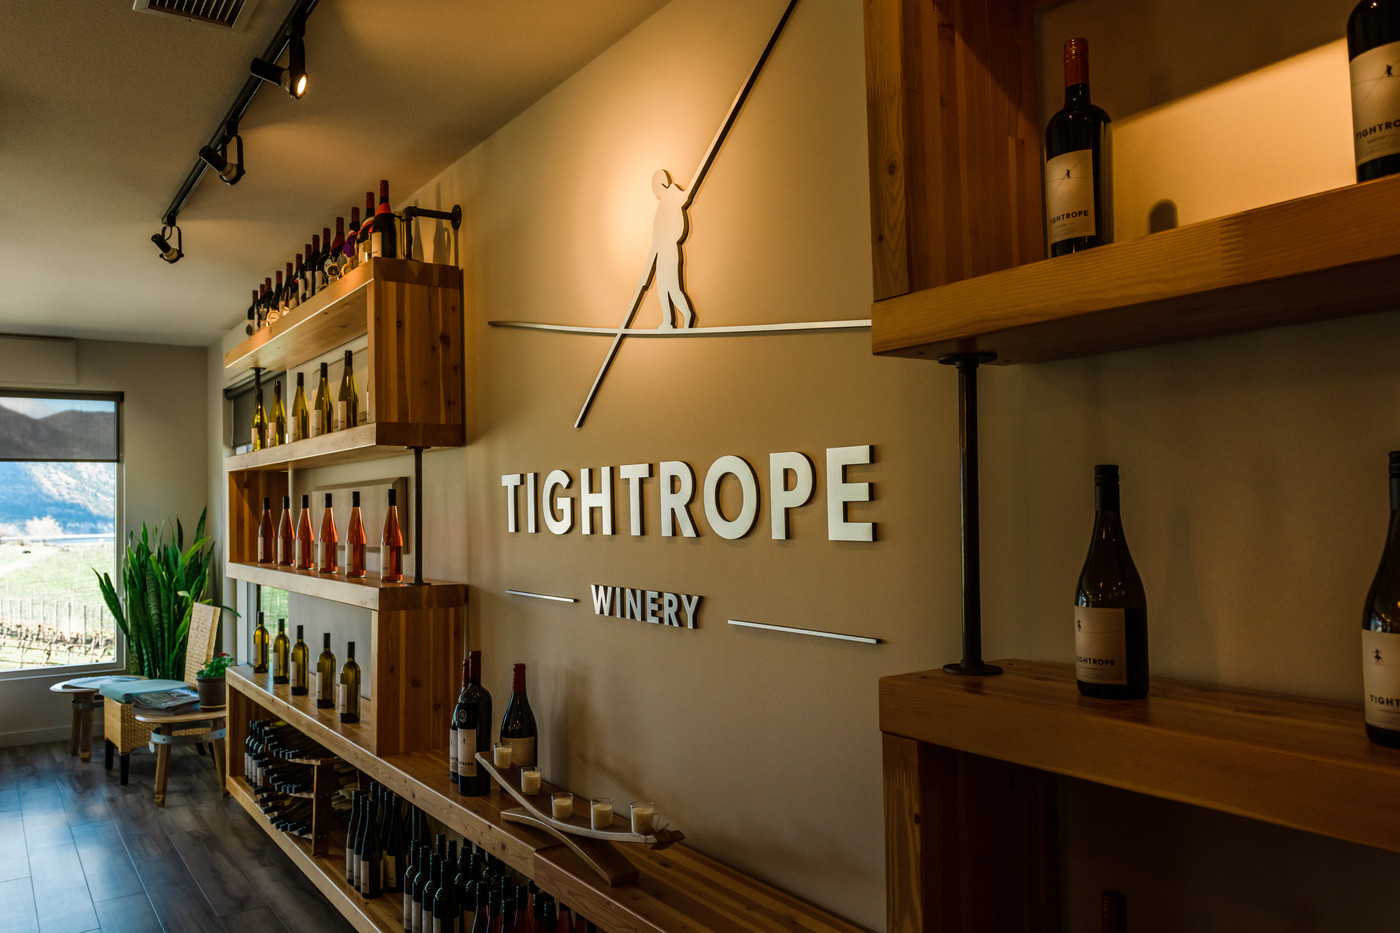 Tightrope9419.jpg